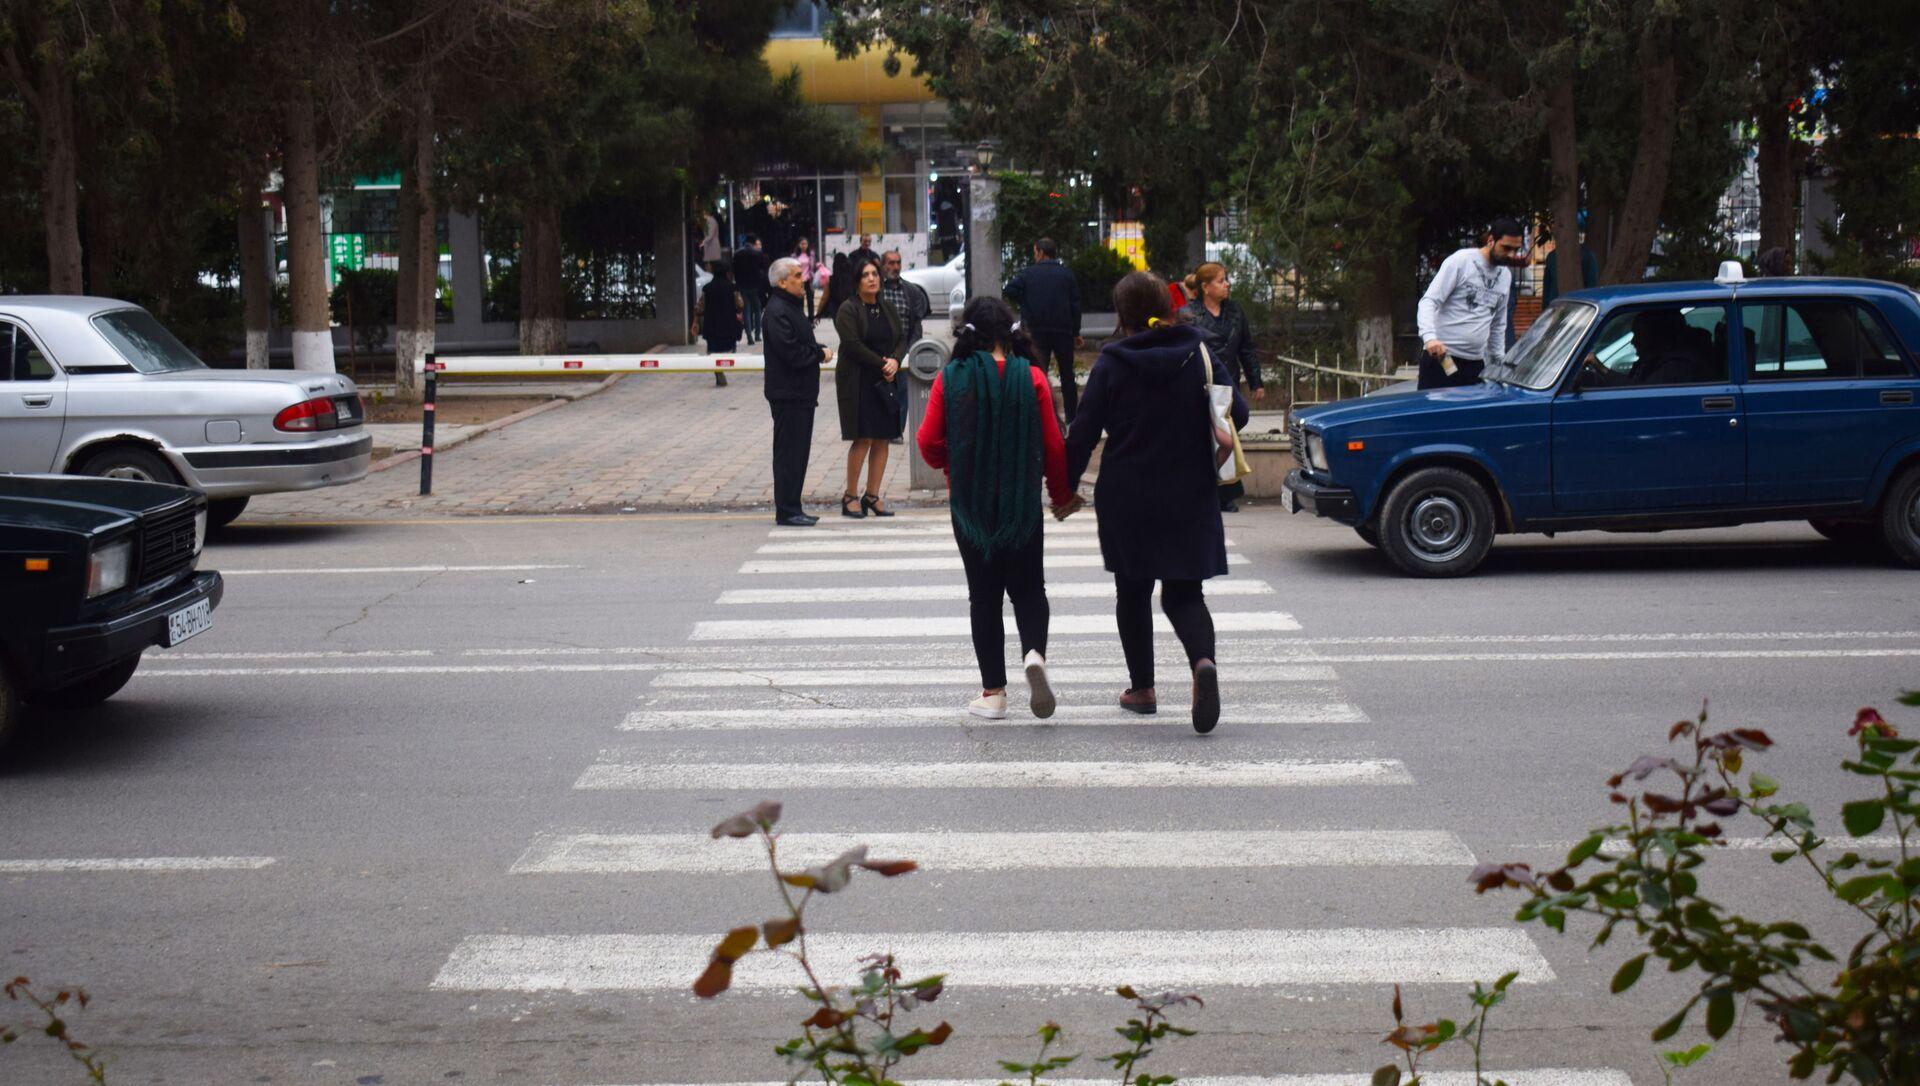 Люди на пешеходном переходе - Sputnik Azərbaycan, 1920, 21.09.2021